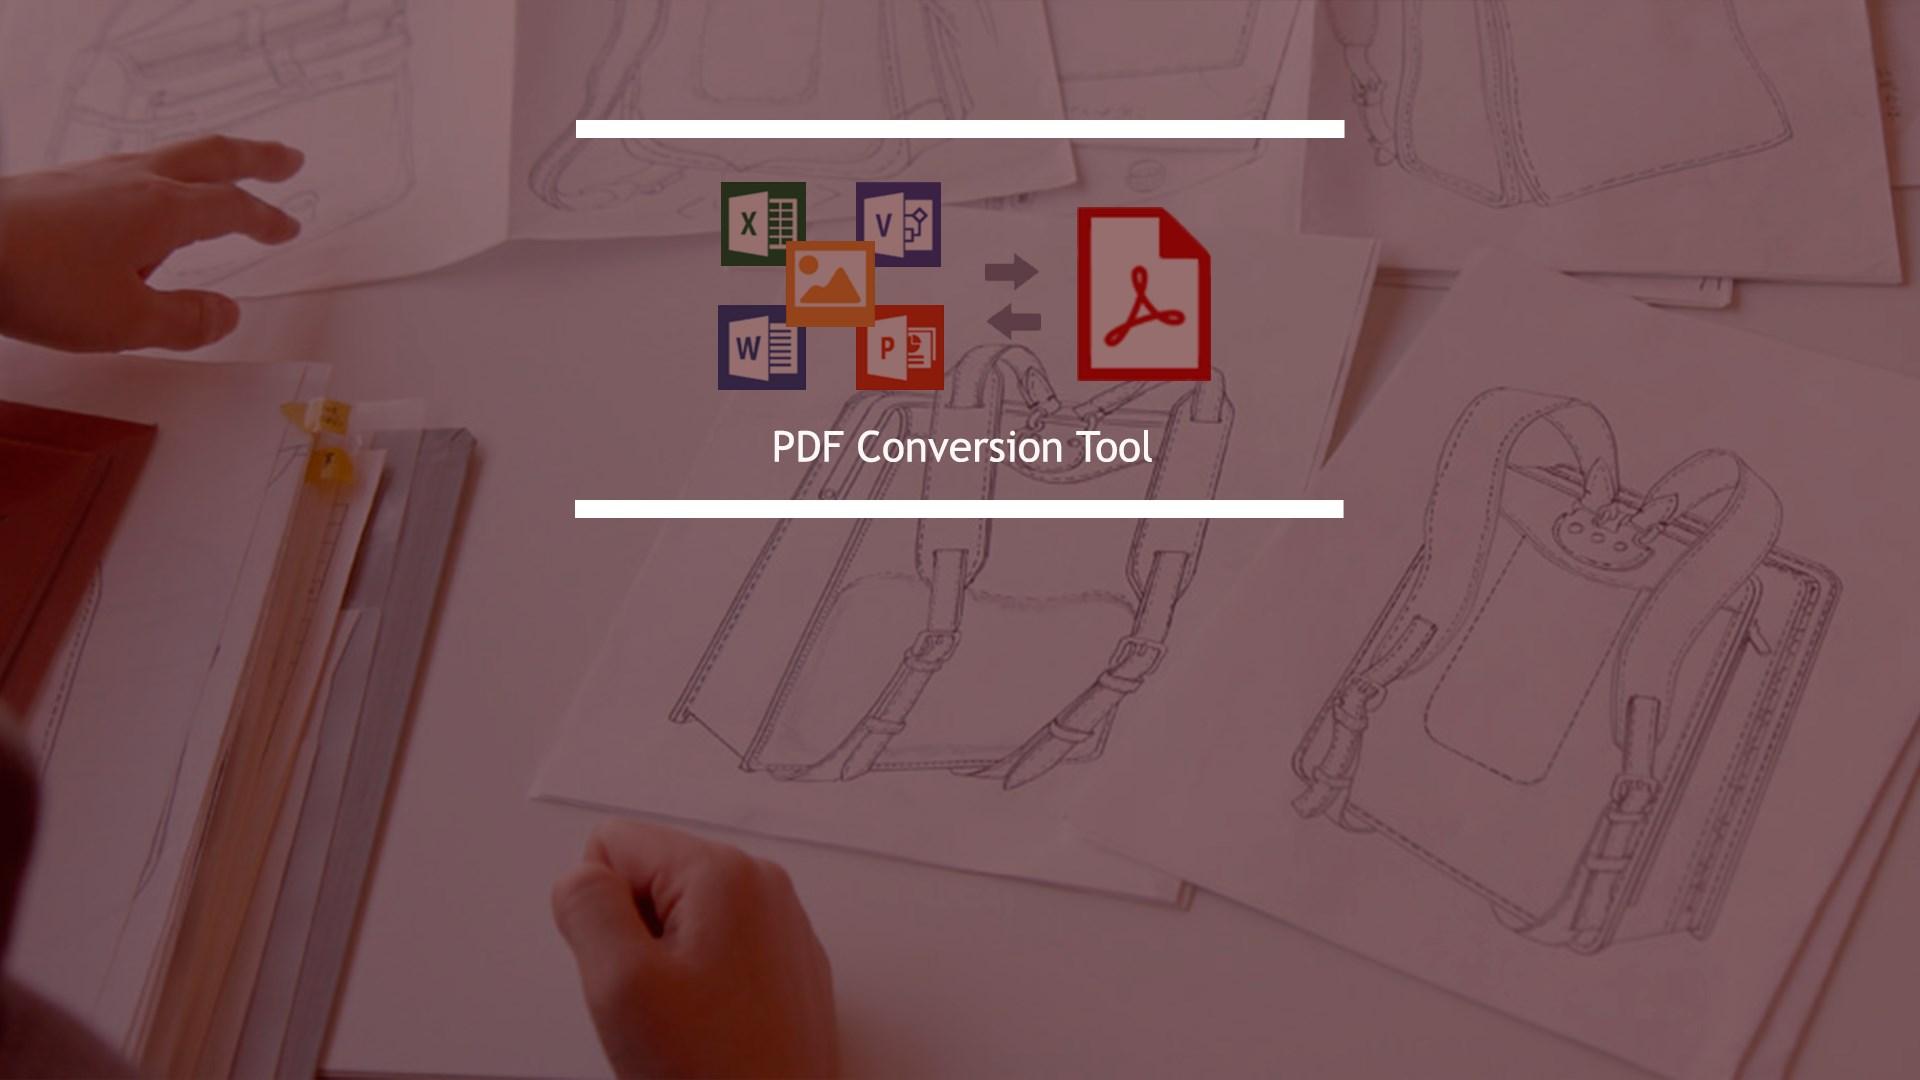 pagemaker to pdf converter offline